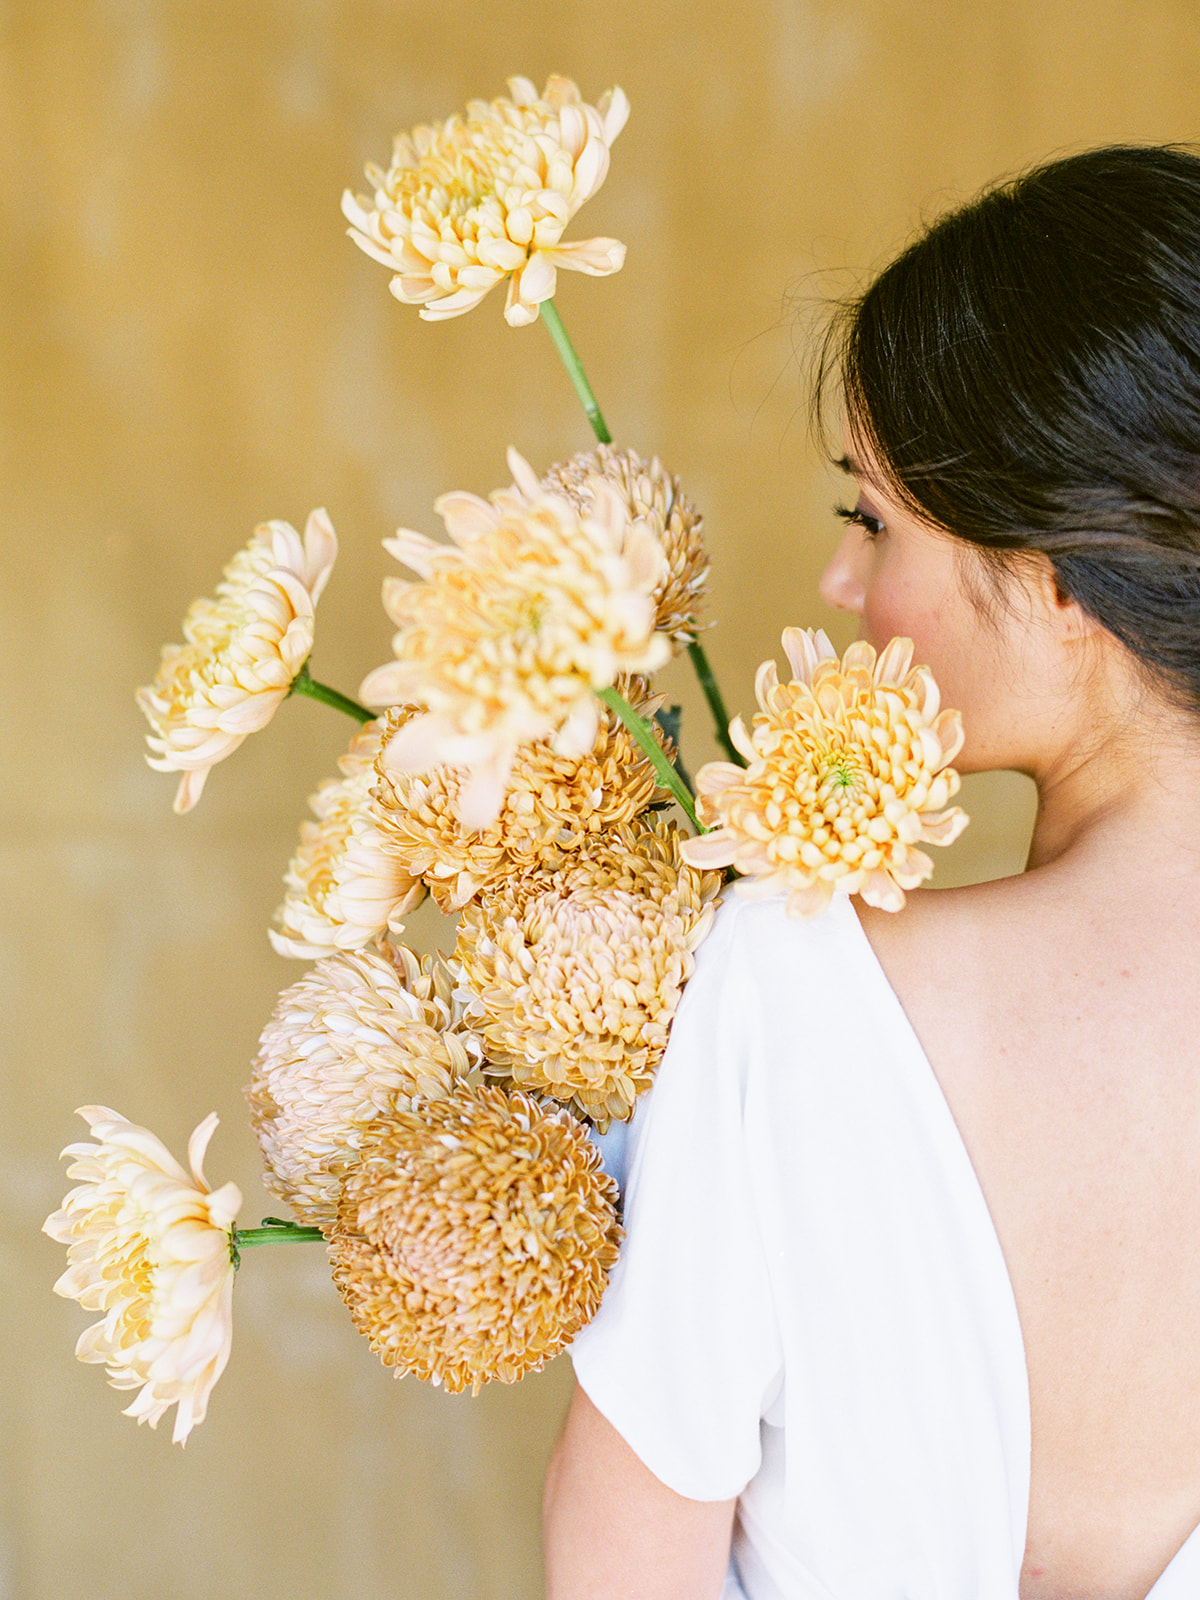 sandra-chau-stylist-fine-art-editorial-shoot-wedding-inspiration-yellowflowers-unearthingtc-1.jpg